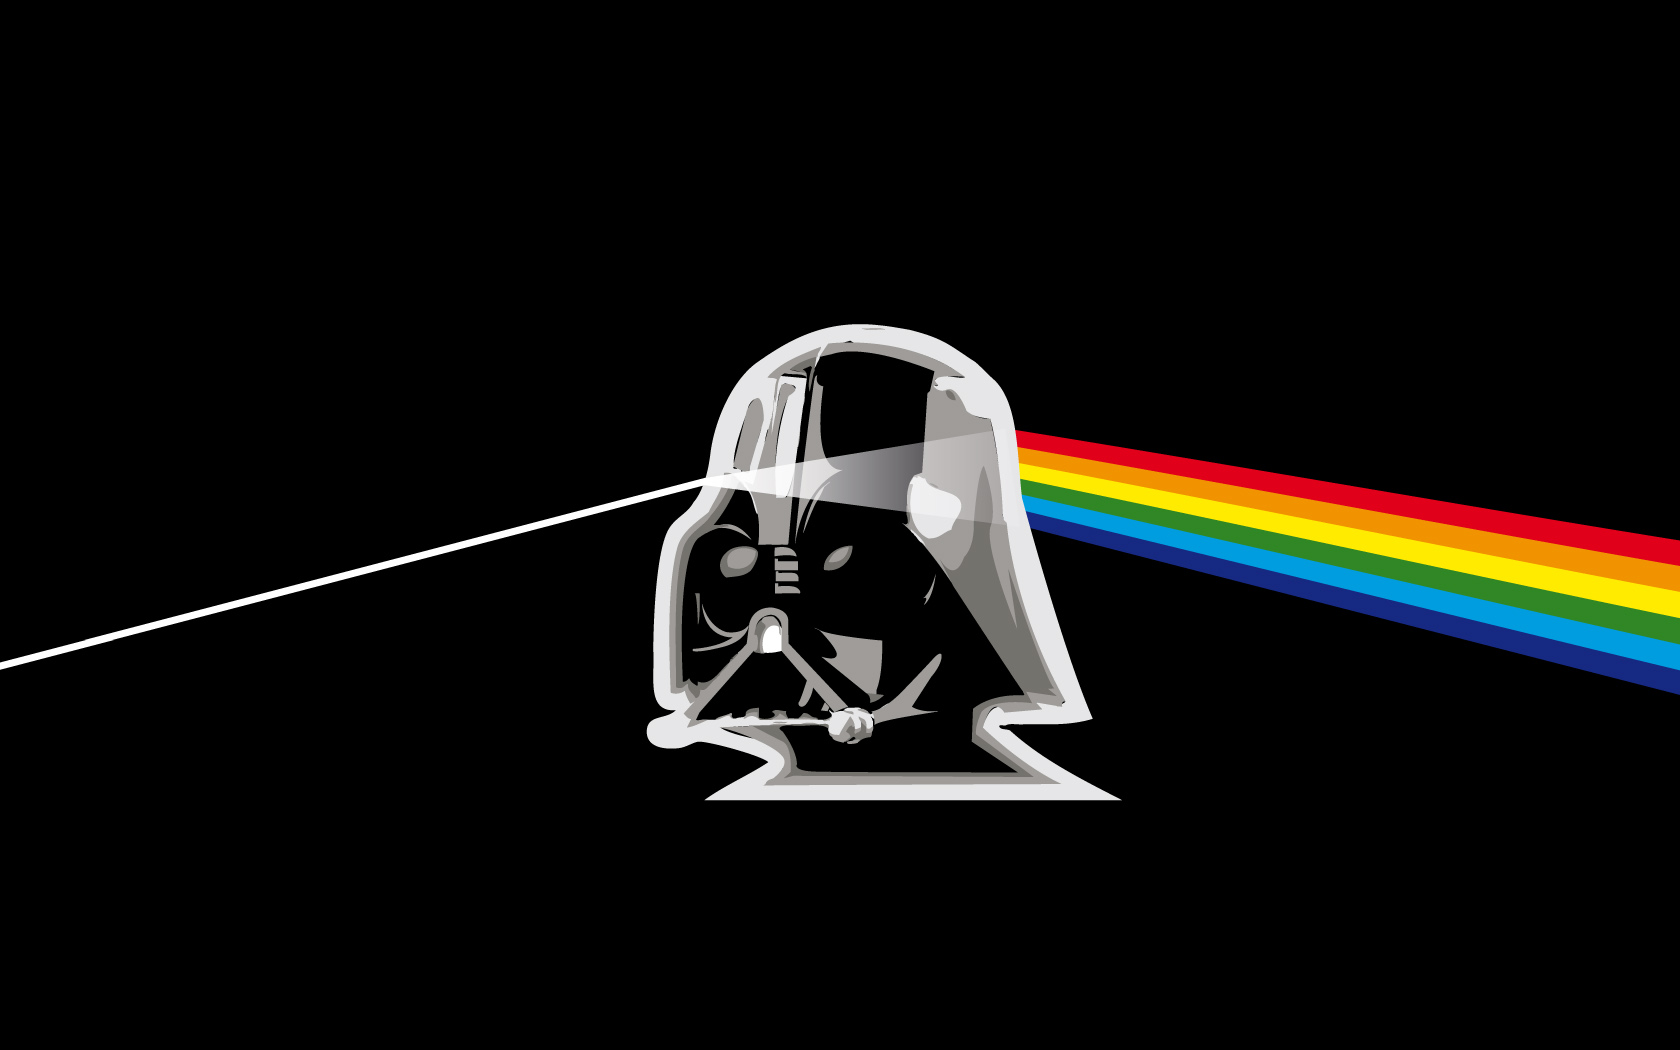 Pink Floyd Wallpaper 1680x1050 Pink Floyd Darth Vader Prism 1680x1050